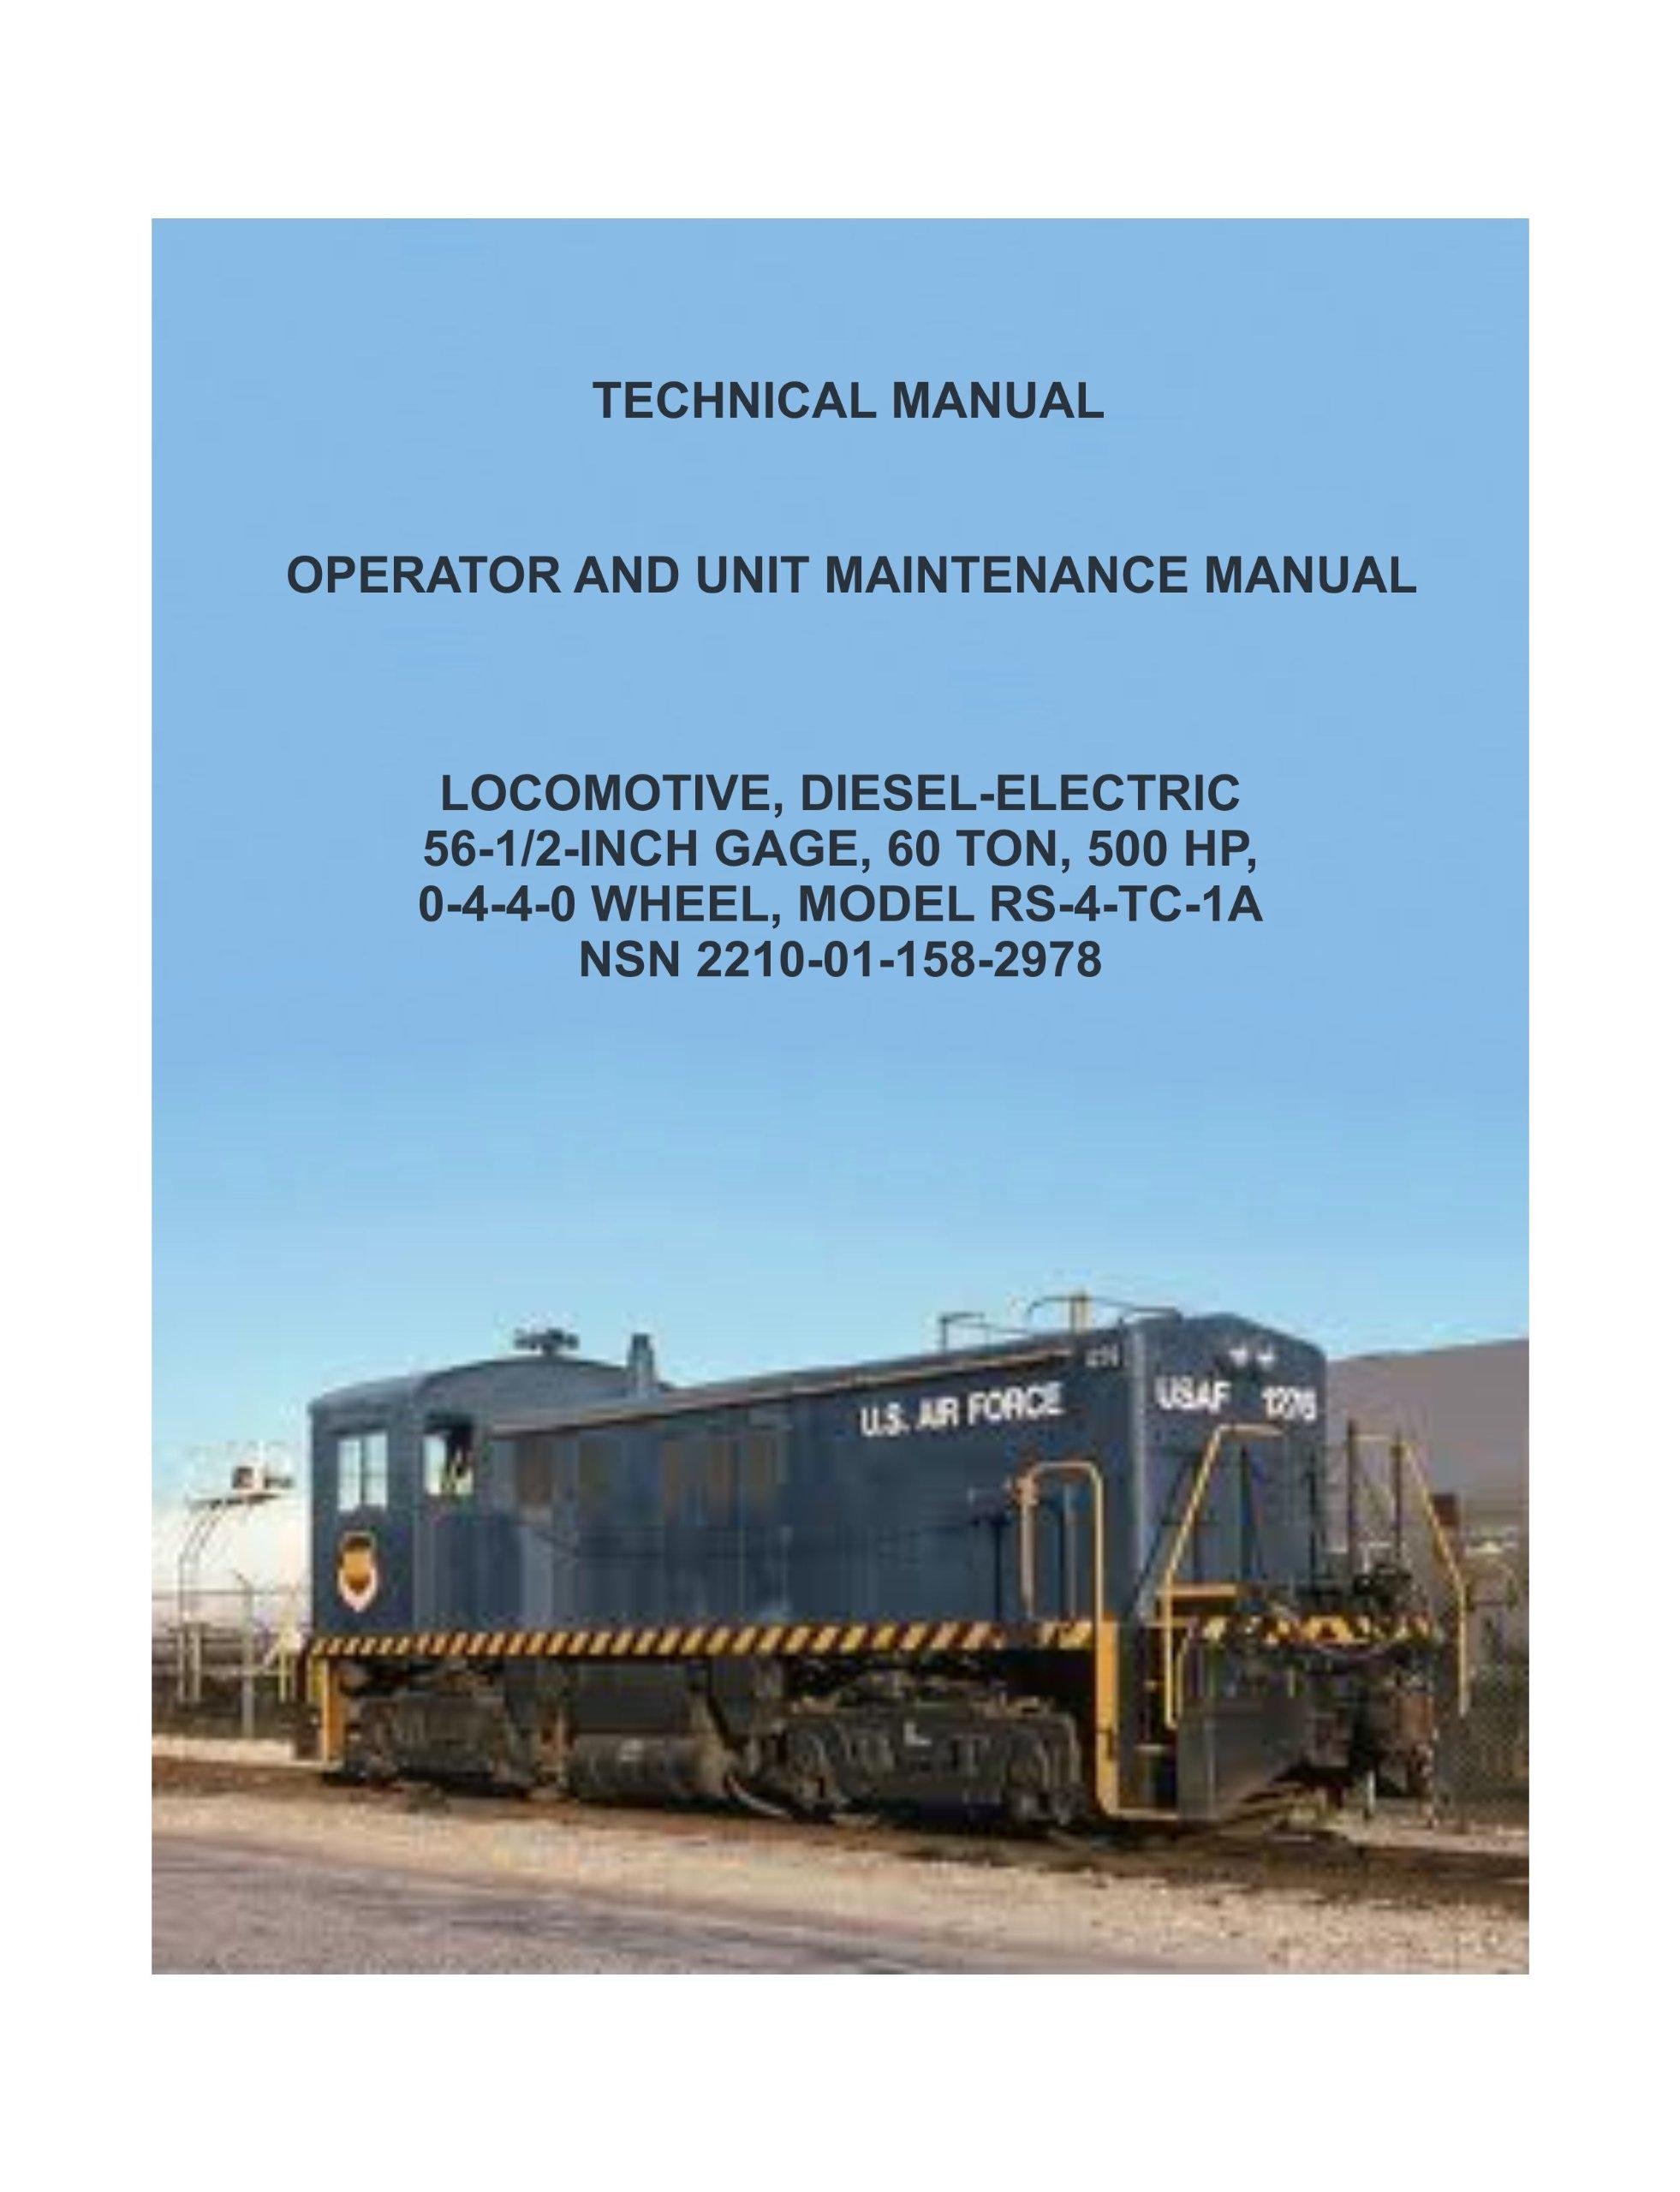 locomotive diesel electric model rs 4 tc 1ansn operator and unit rh amazon com TC- 4C Scion tC 4 Door